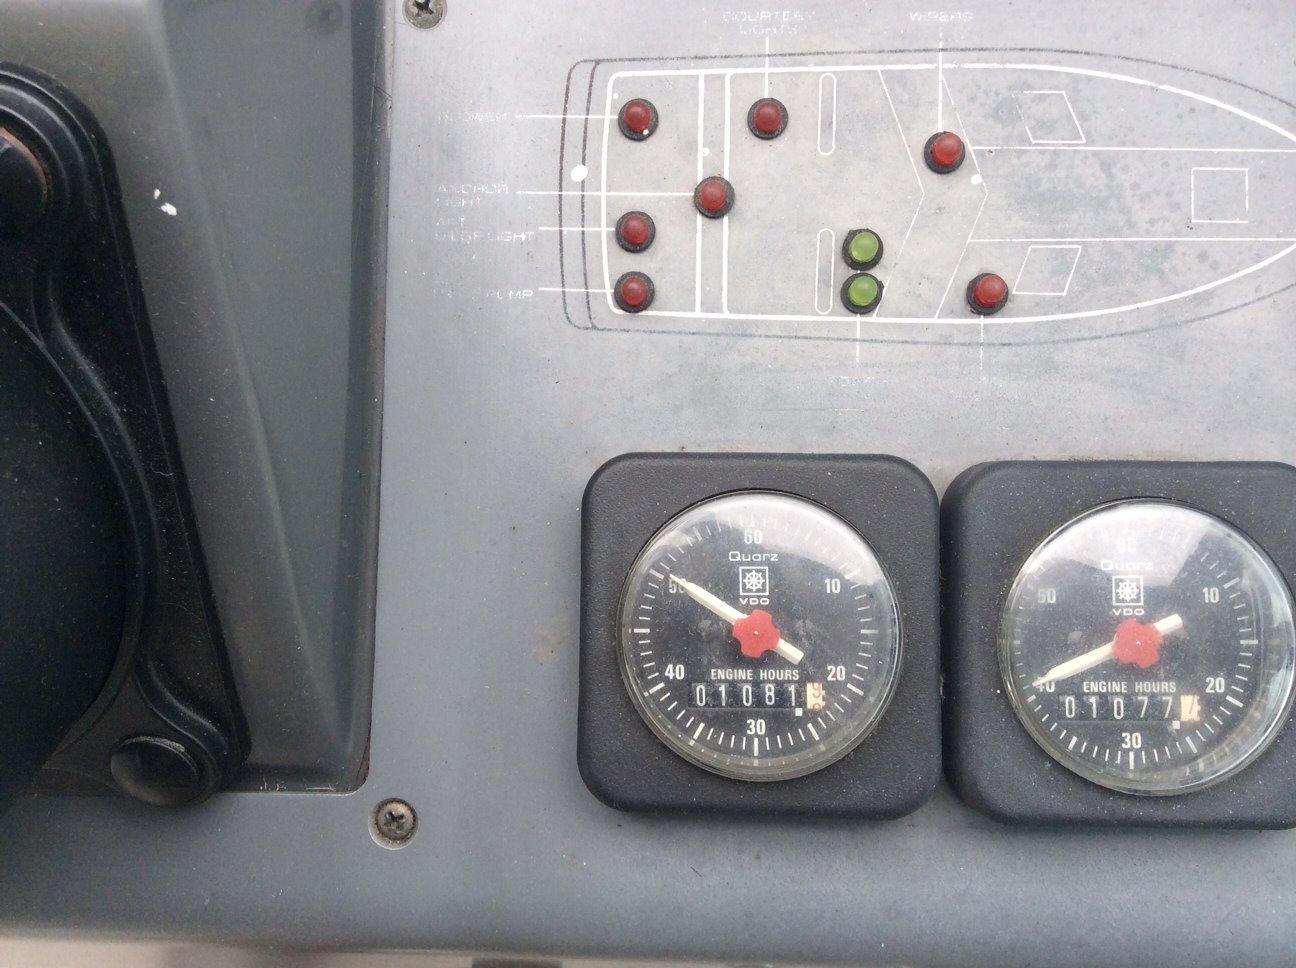 Cruiser's IncEsprit 3170